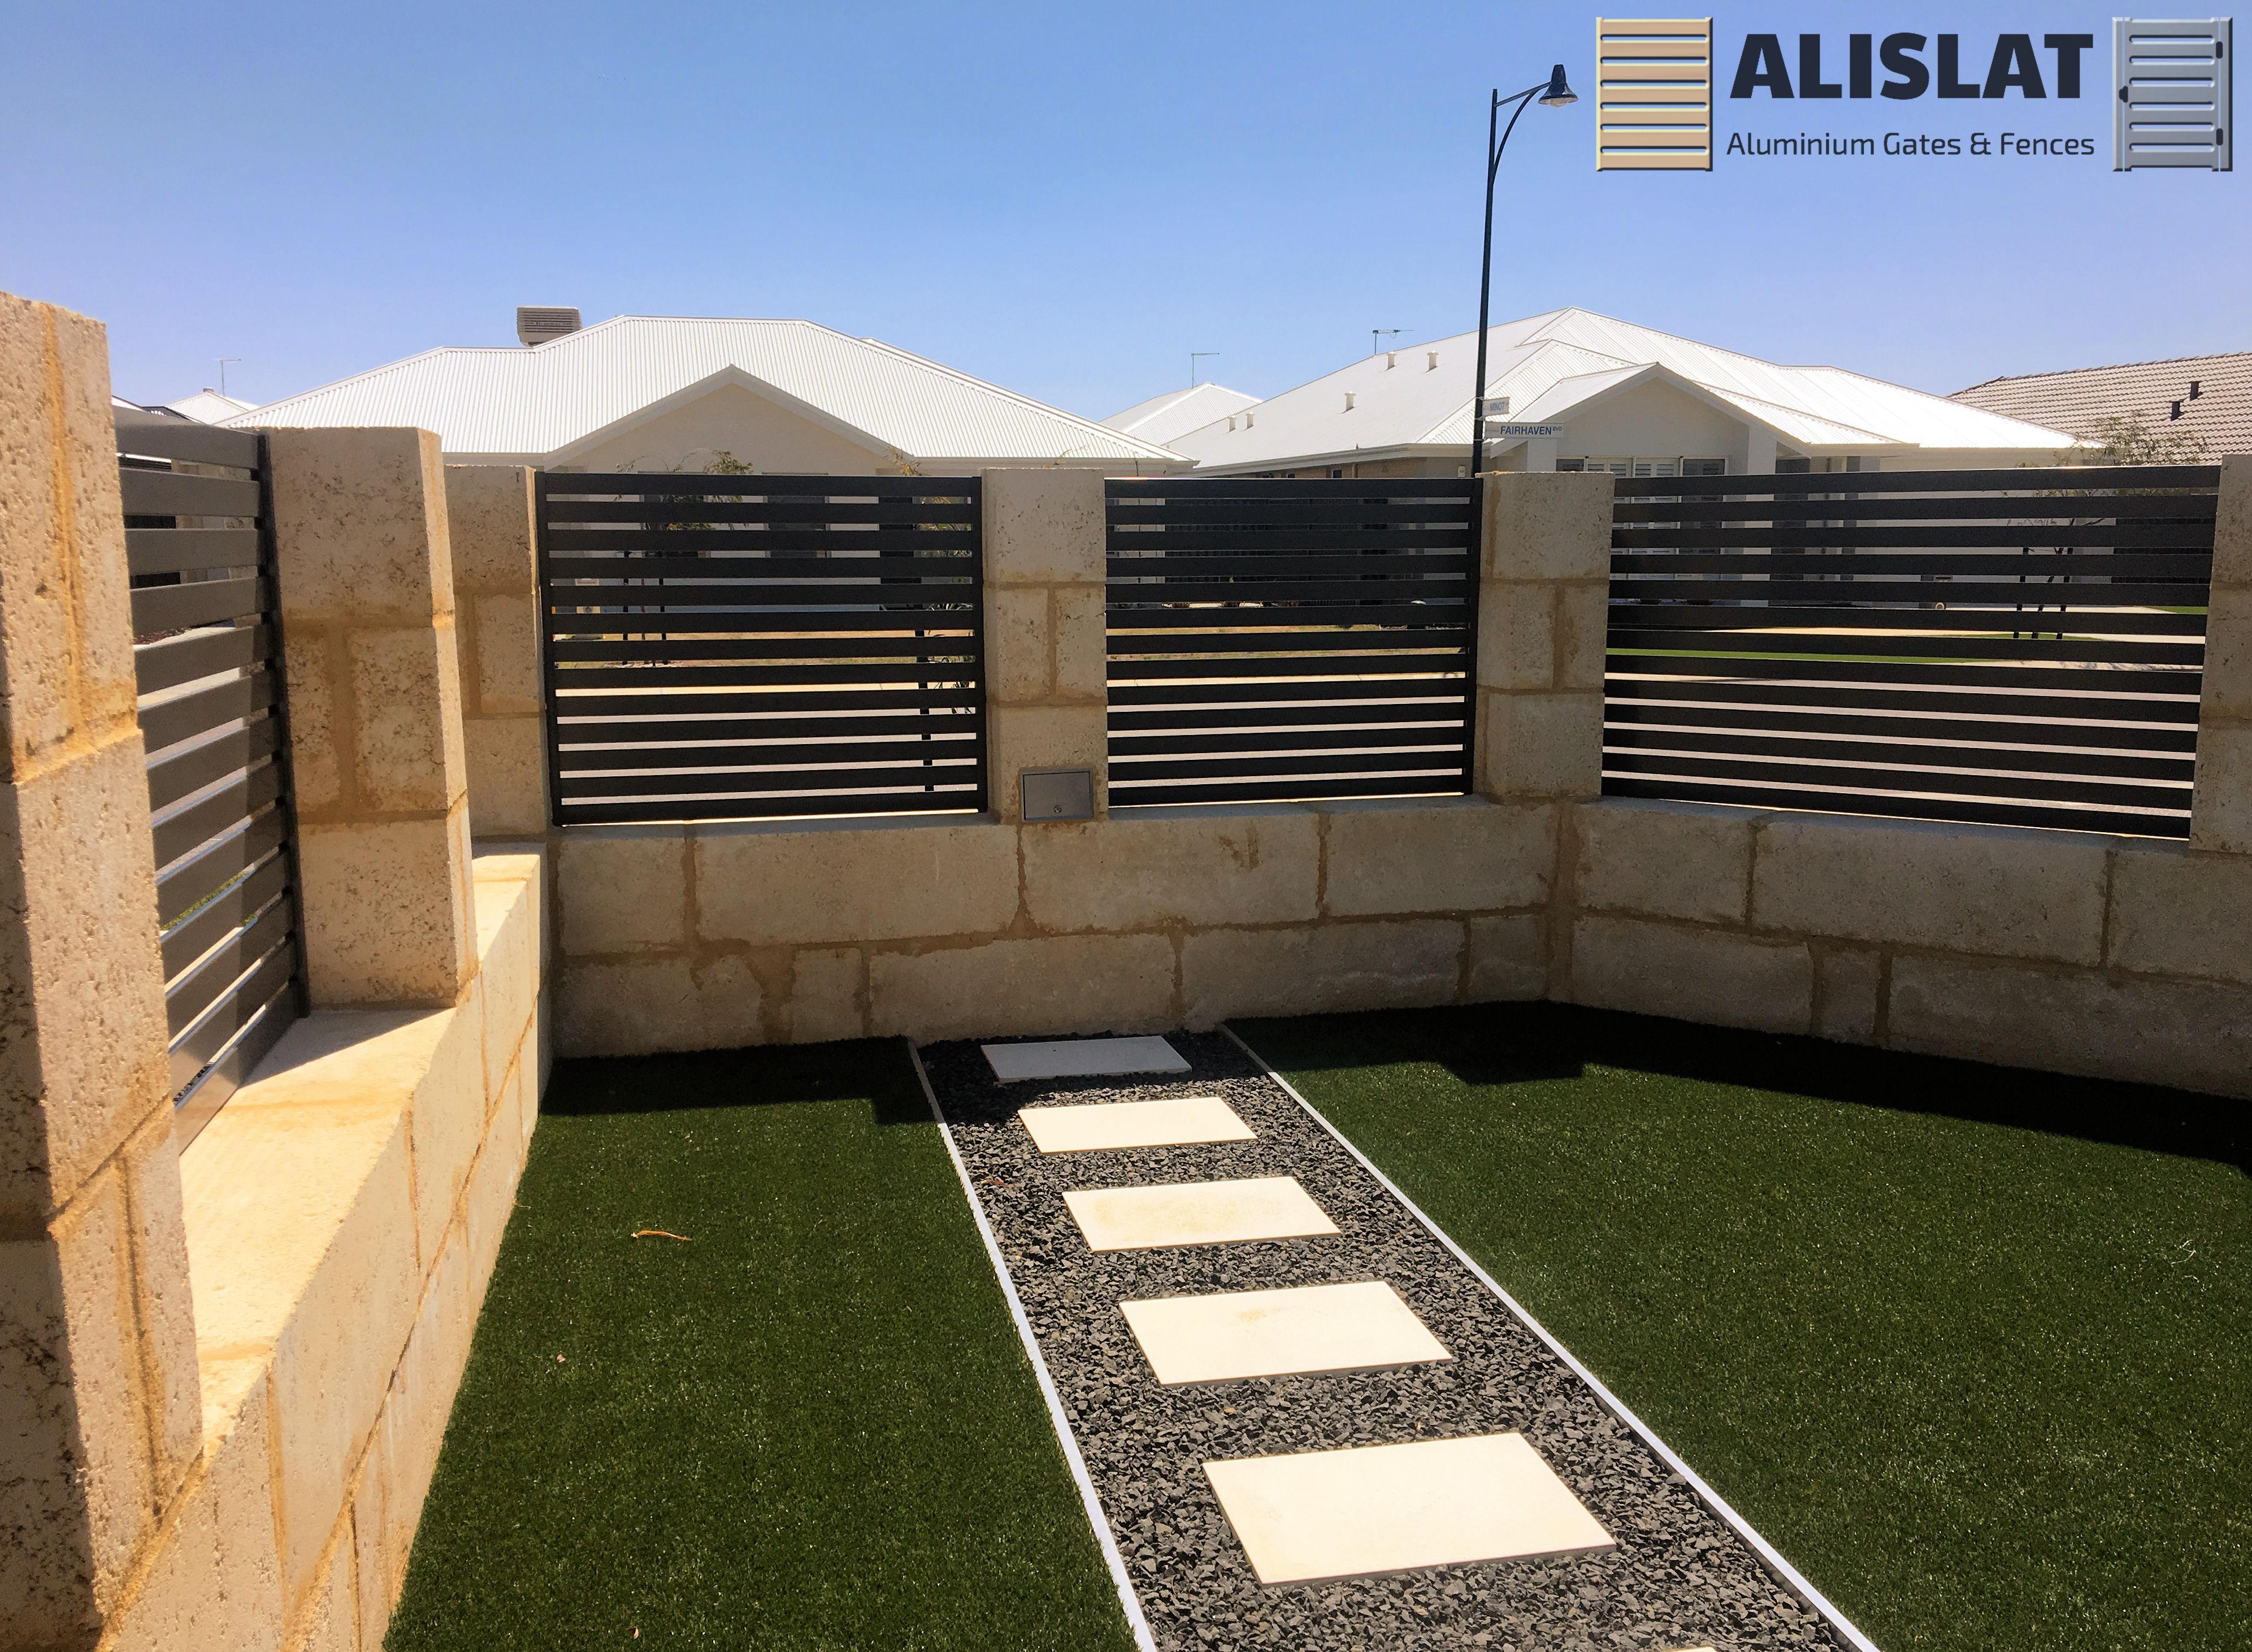 ALISLAT Australian Slat Fencing1